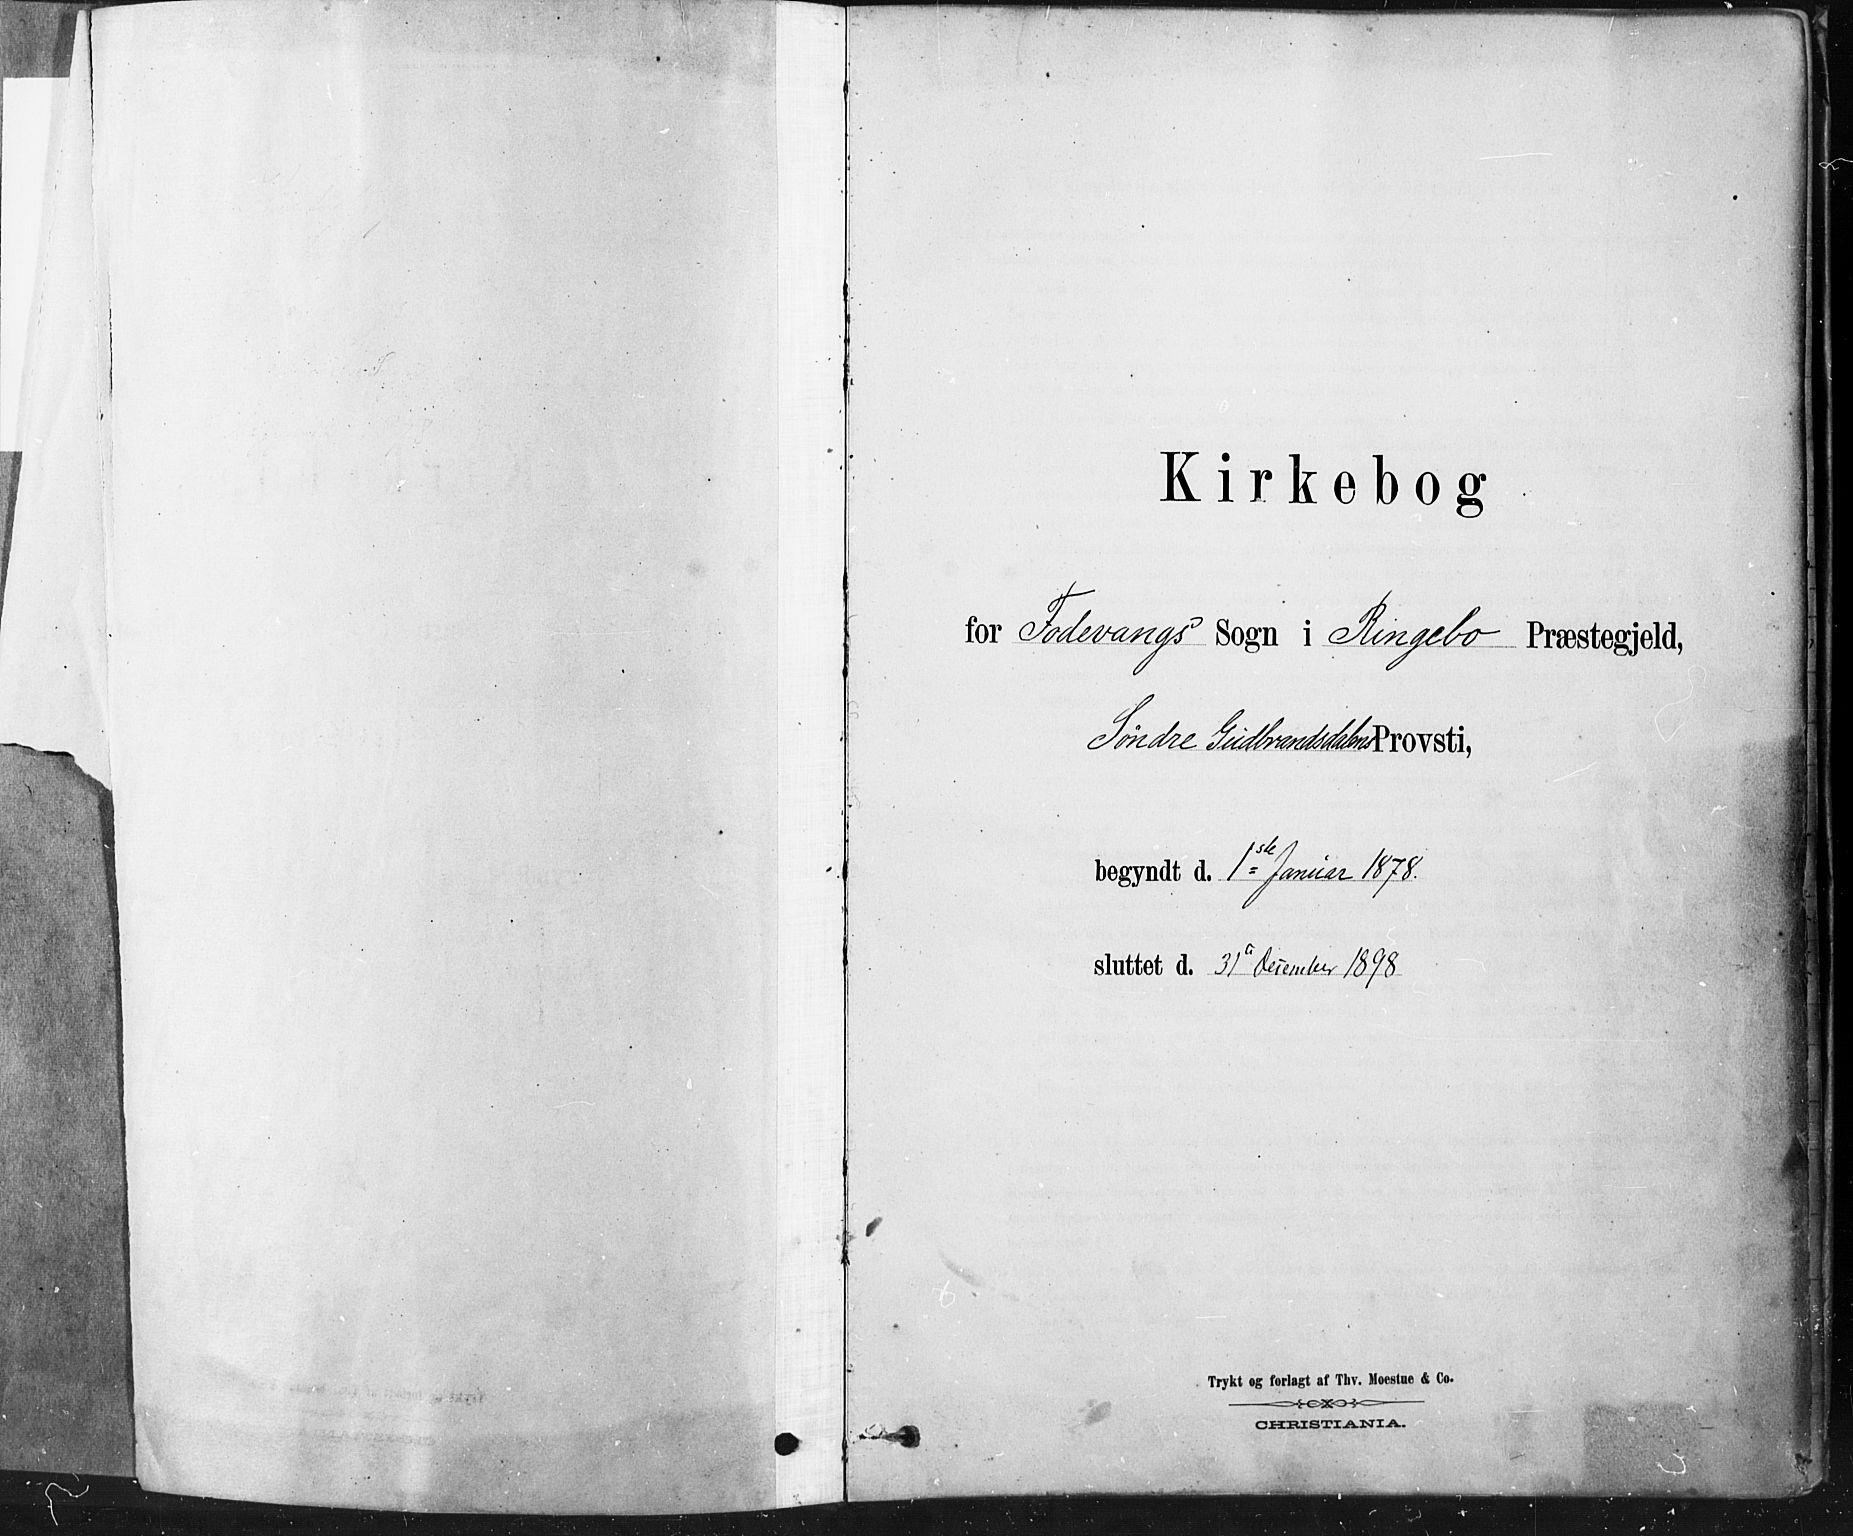 SAH, Ringebu prestekontor, Ministerialbok nr. 9, 1878-1898